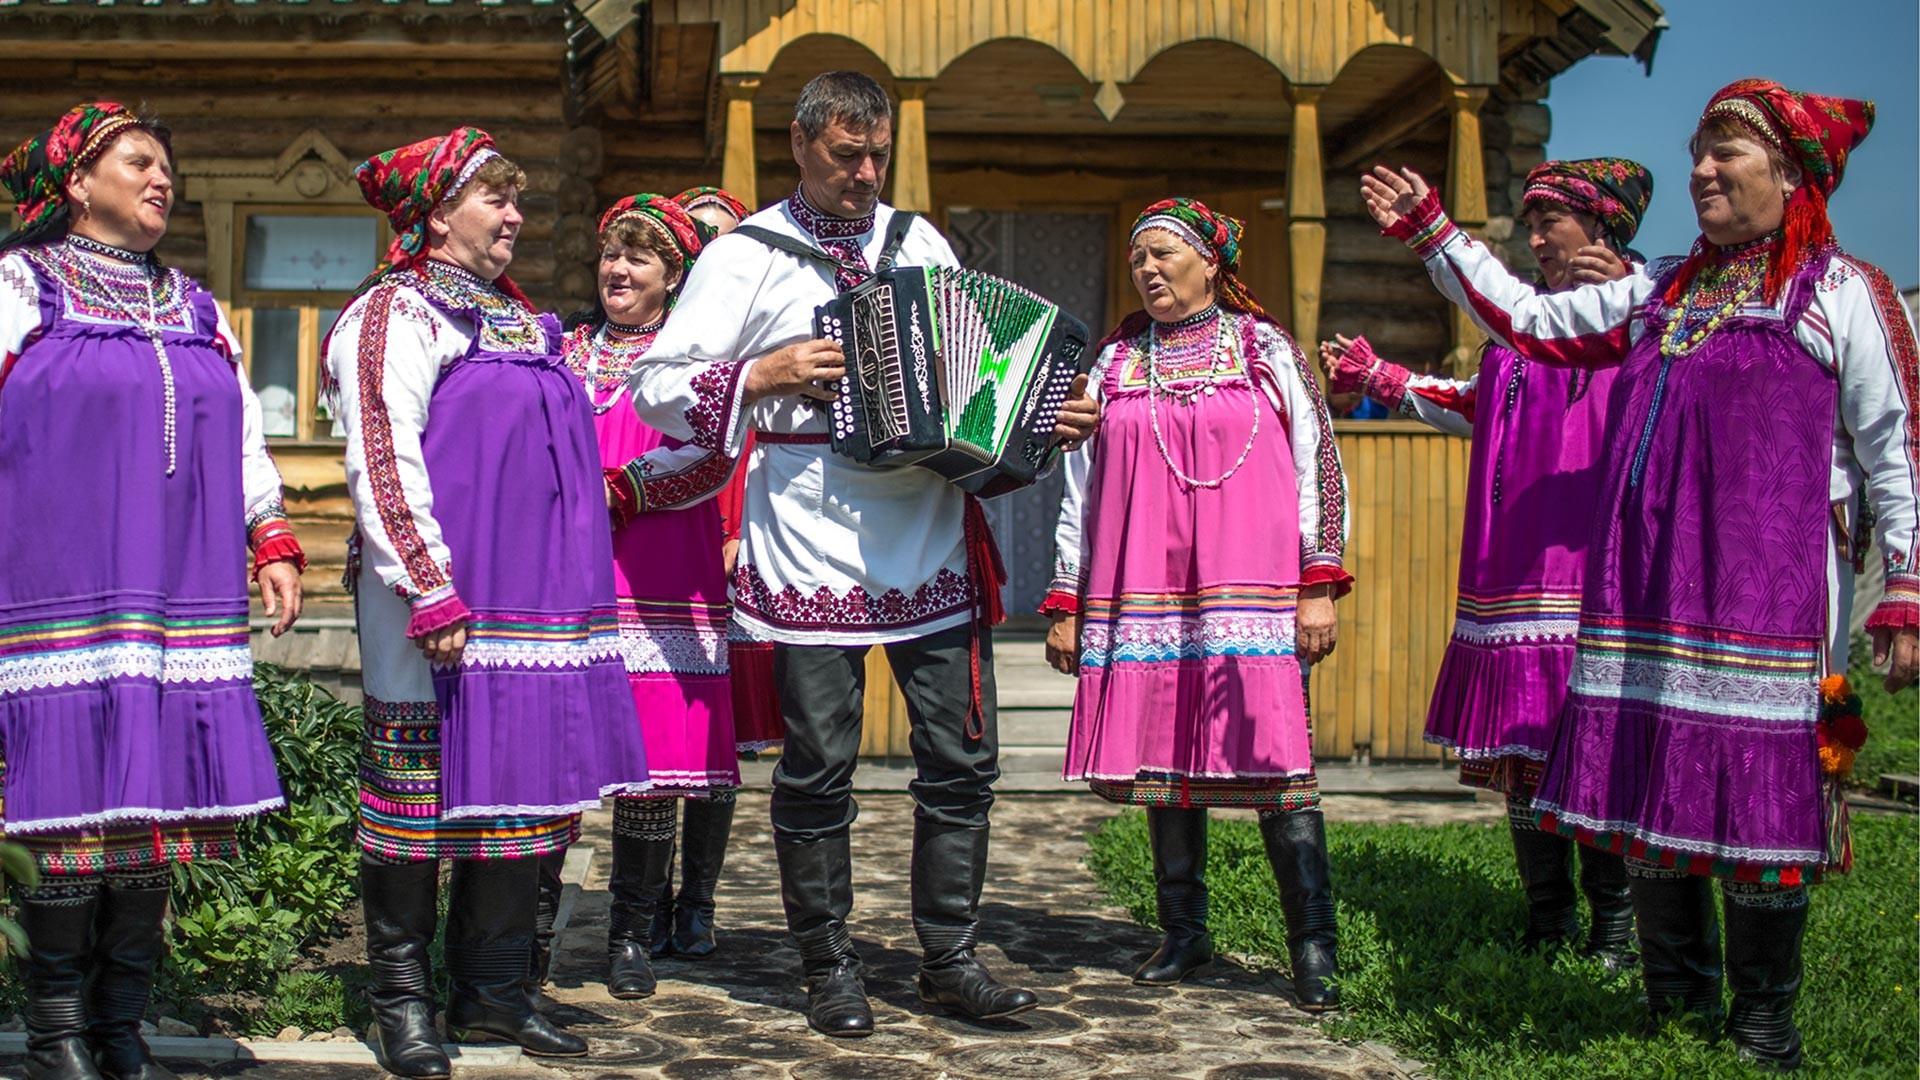 Centre culturel dans le village de Staraïa Terizmorga, en République de Mordovie